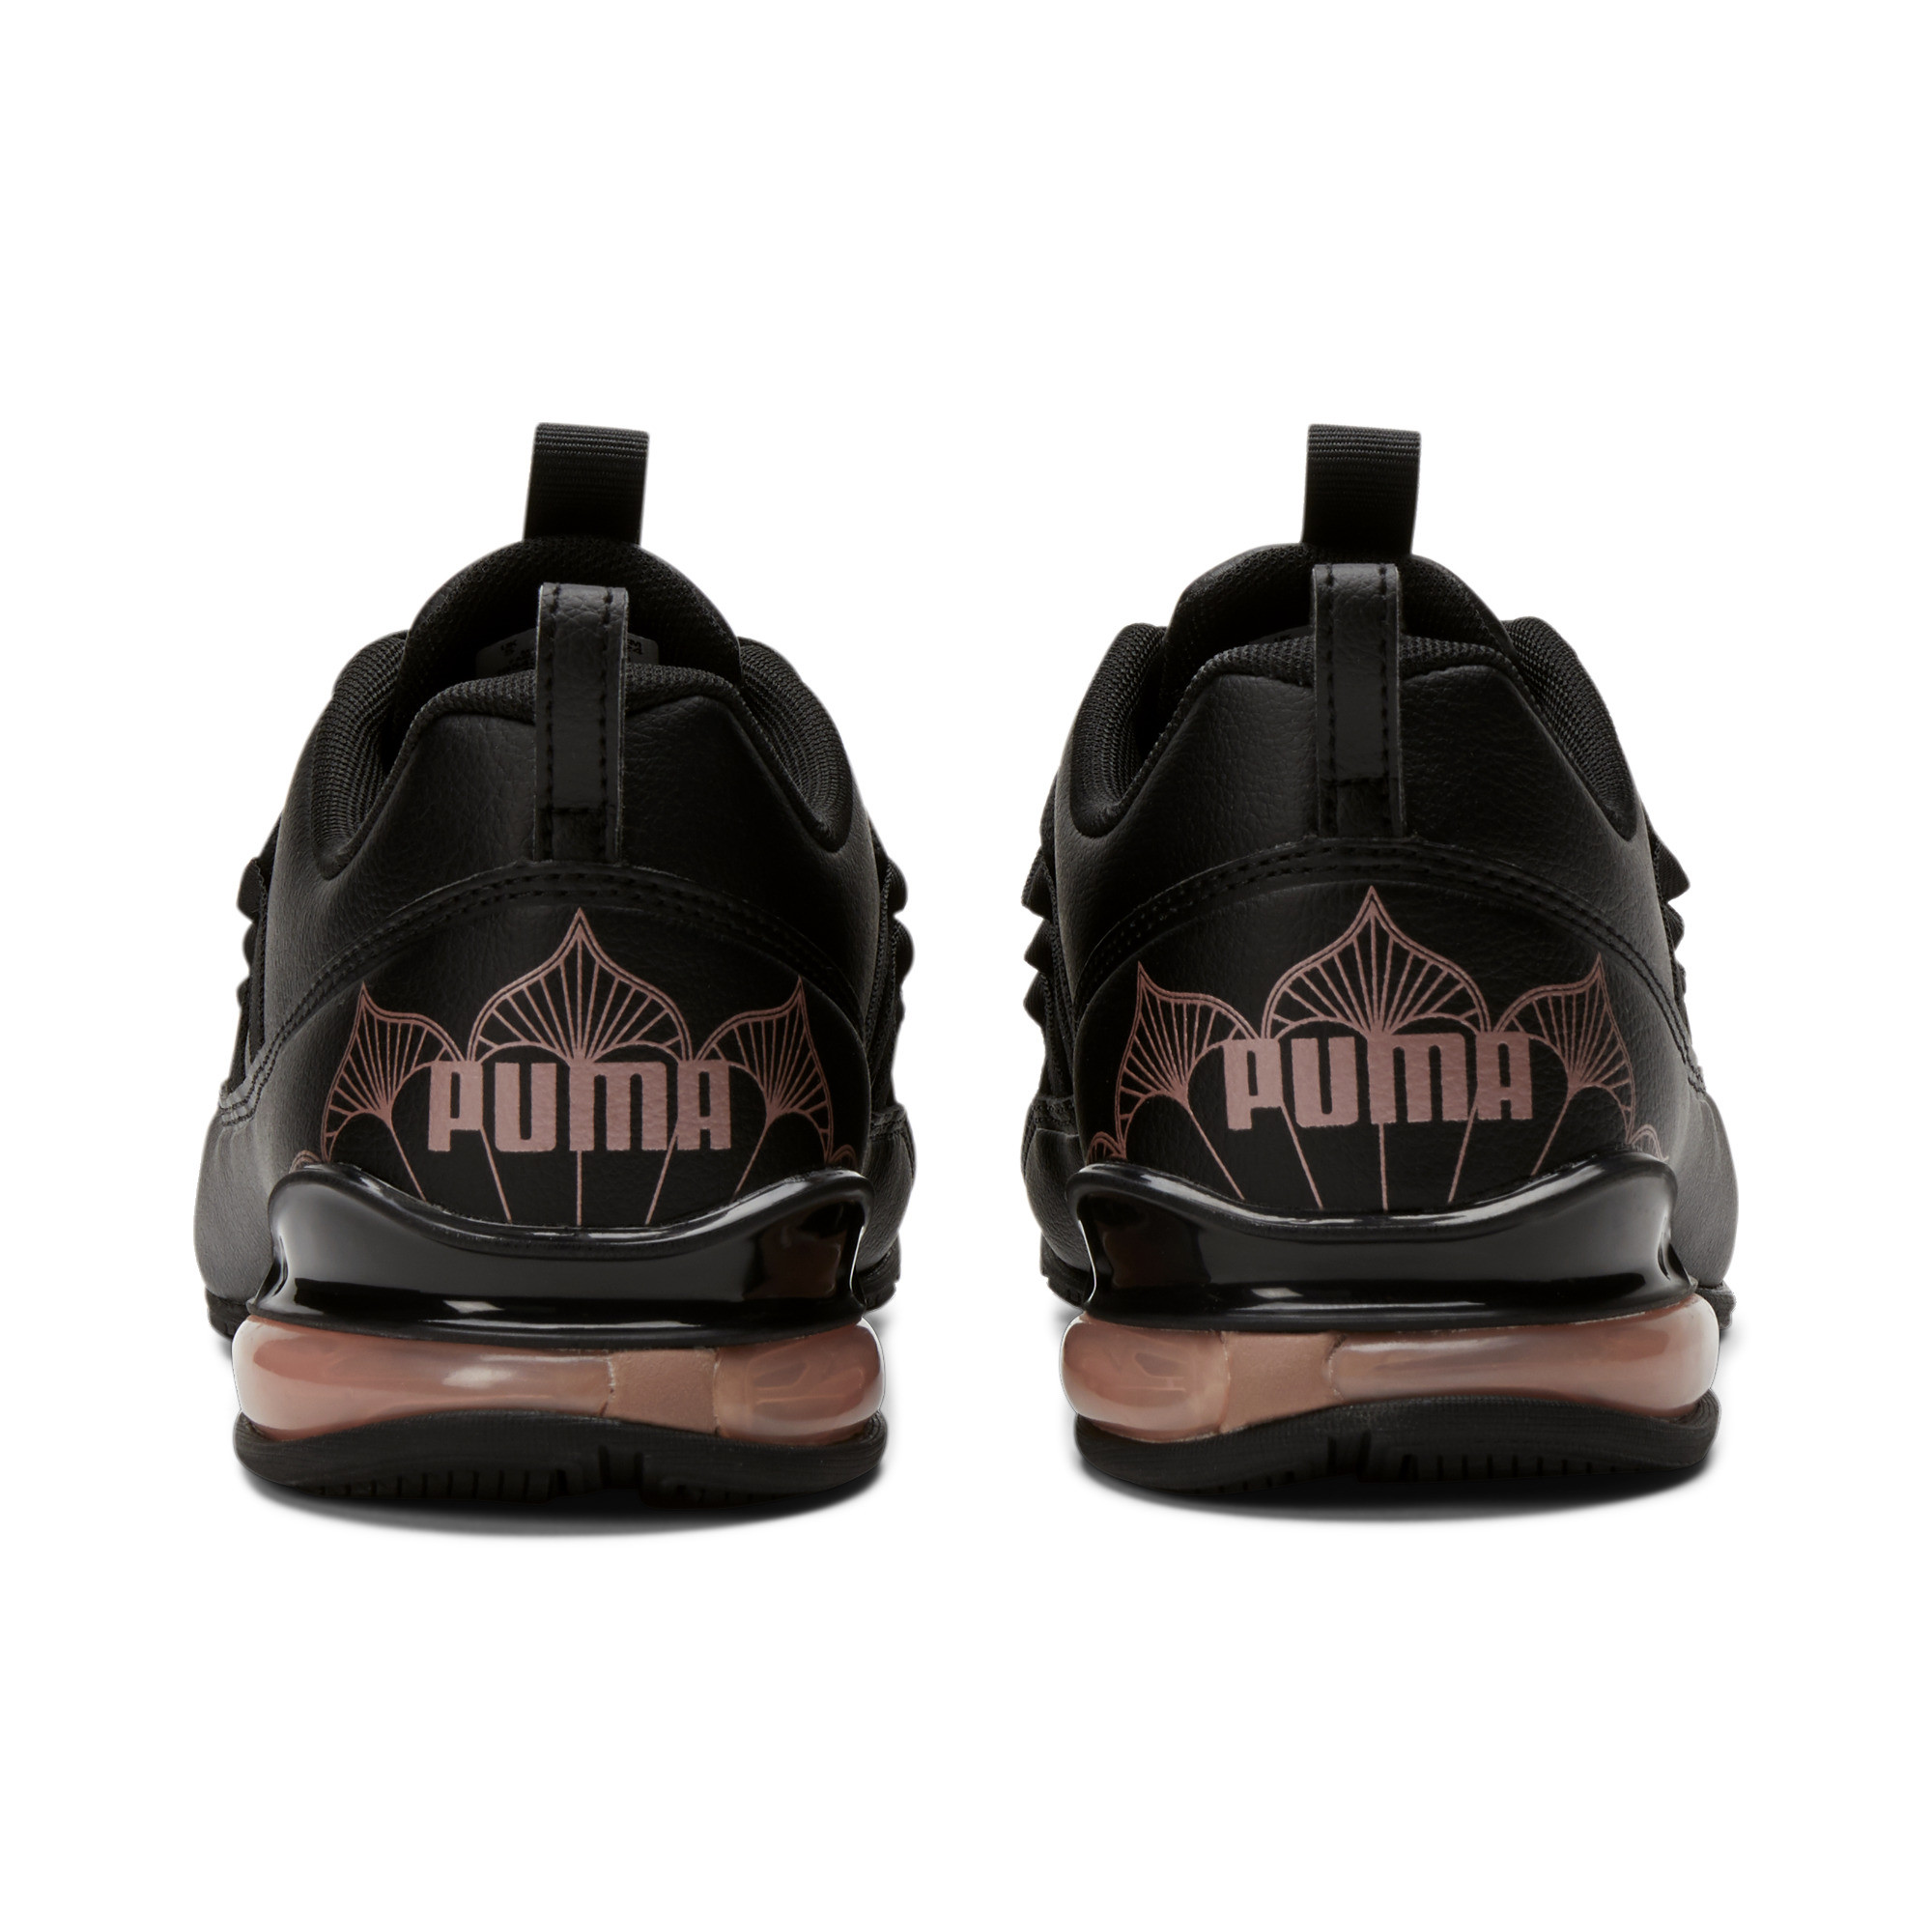 thumbnail 6 - PUMA Women's Riaze Prowl Mandala Training Shoes